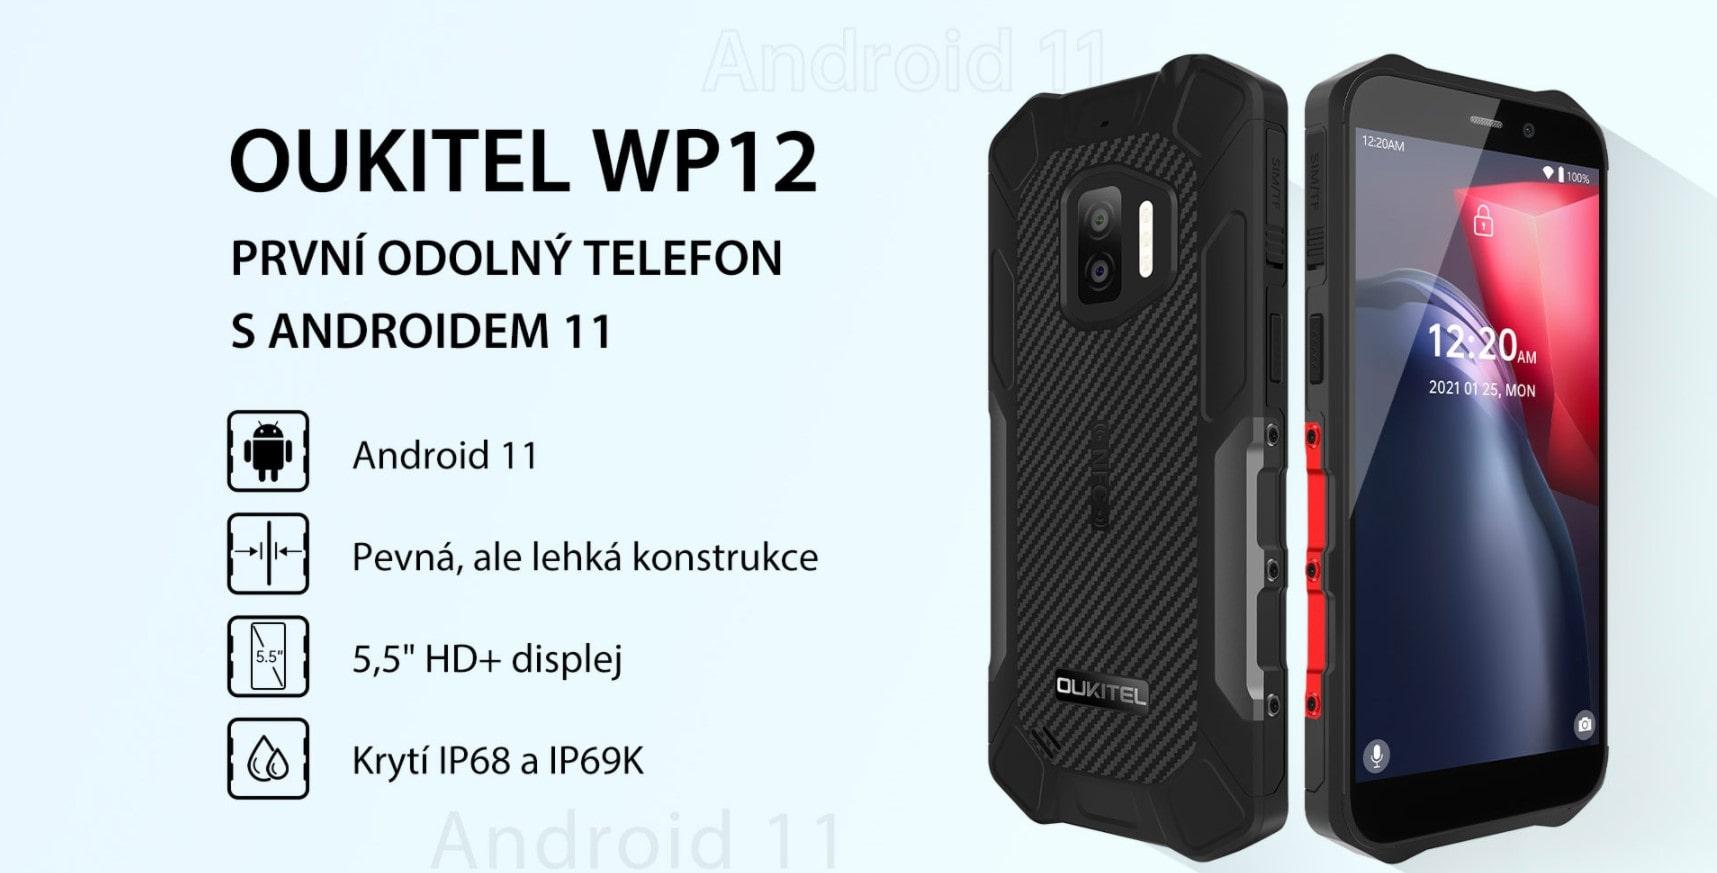 WP12 parametry